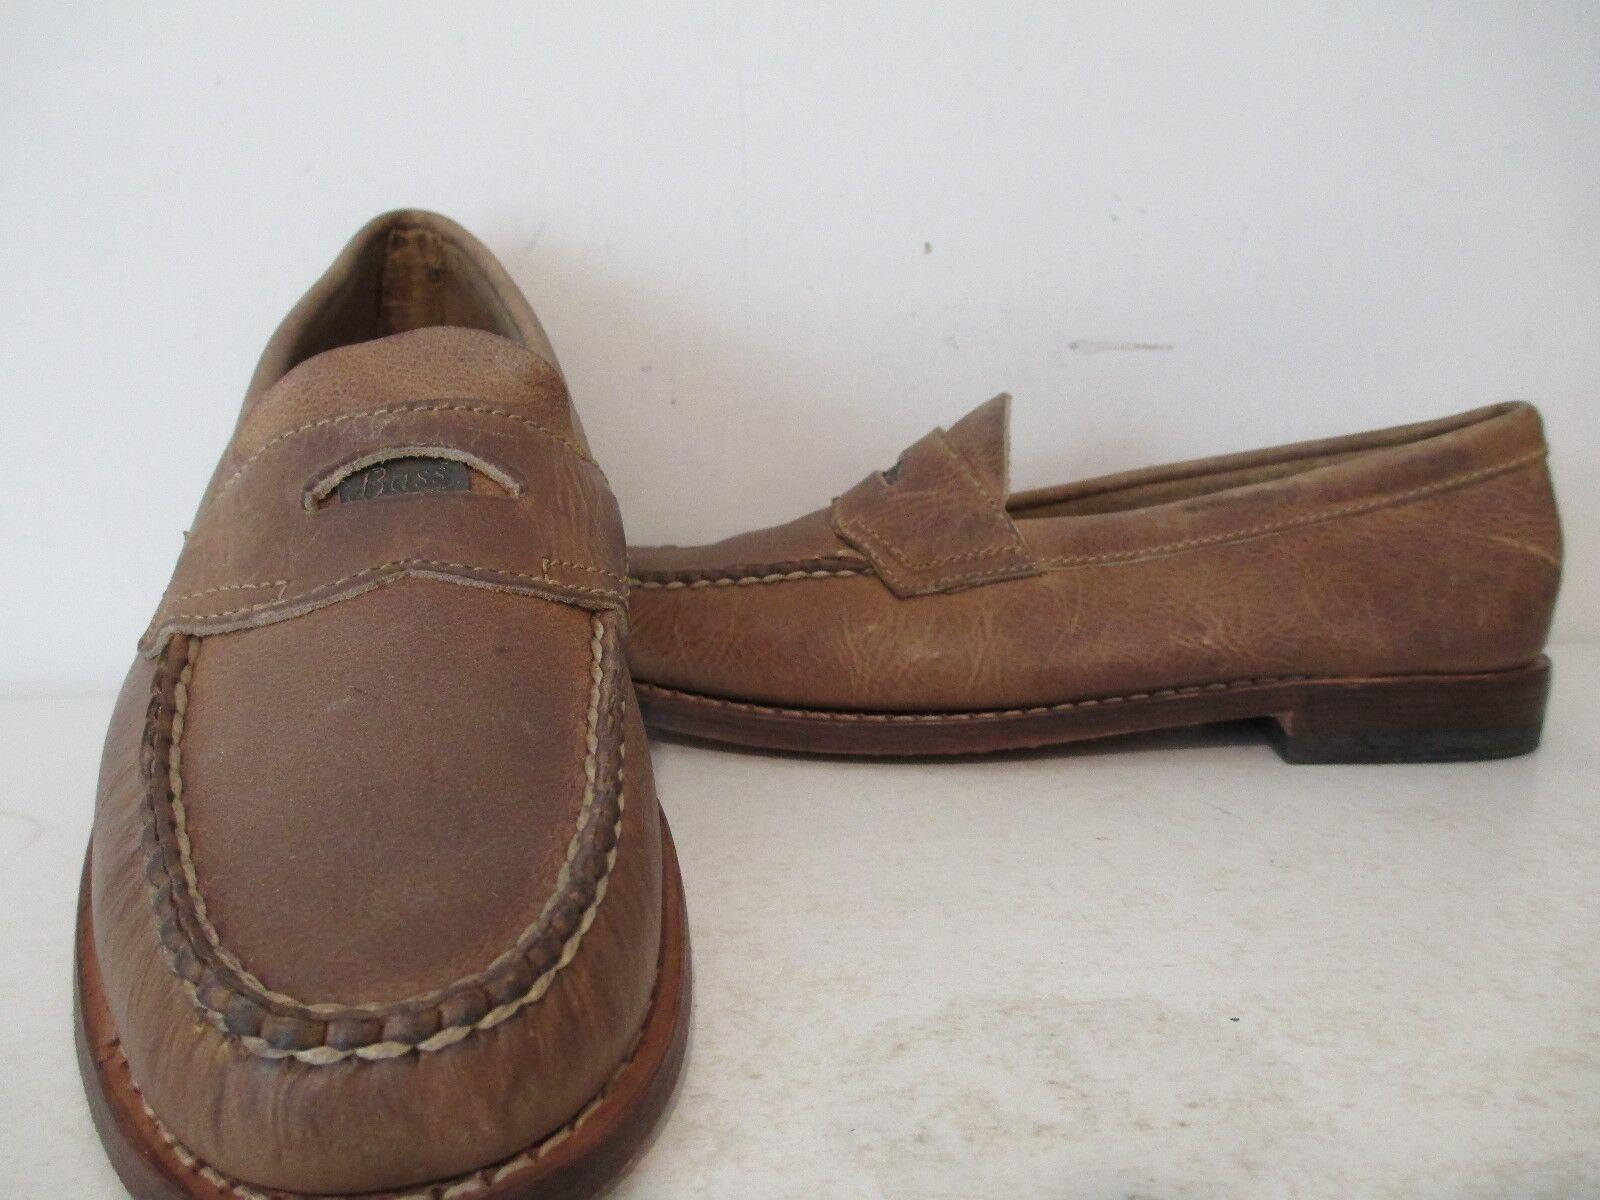 Bass Weejuns Damenschuhe Waylon Distressed Leder Penny Loafer Slip-On Schuhes Tan 6 M